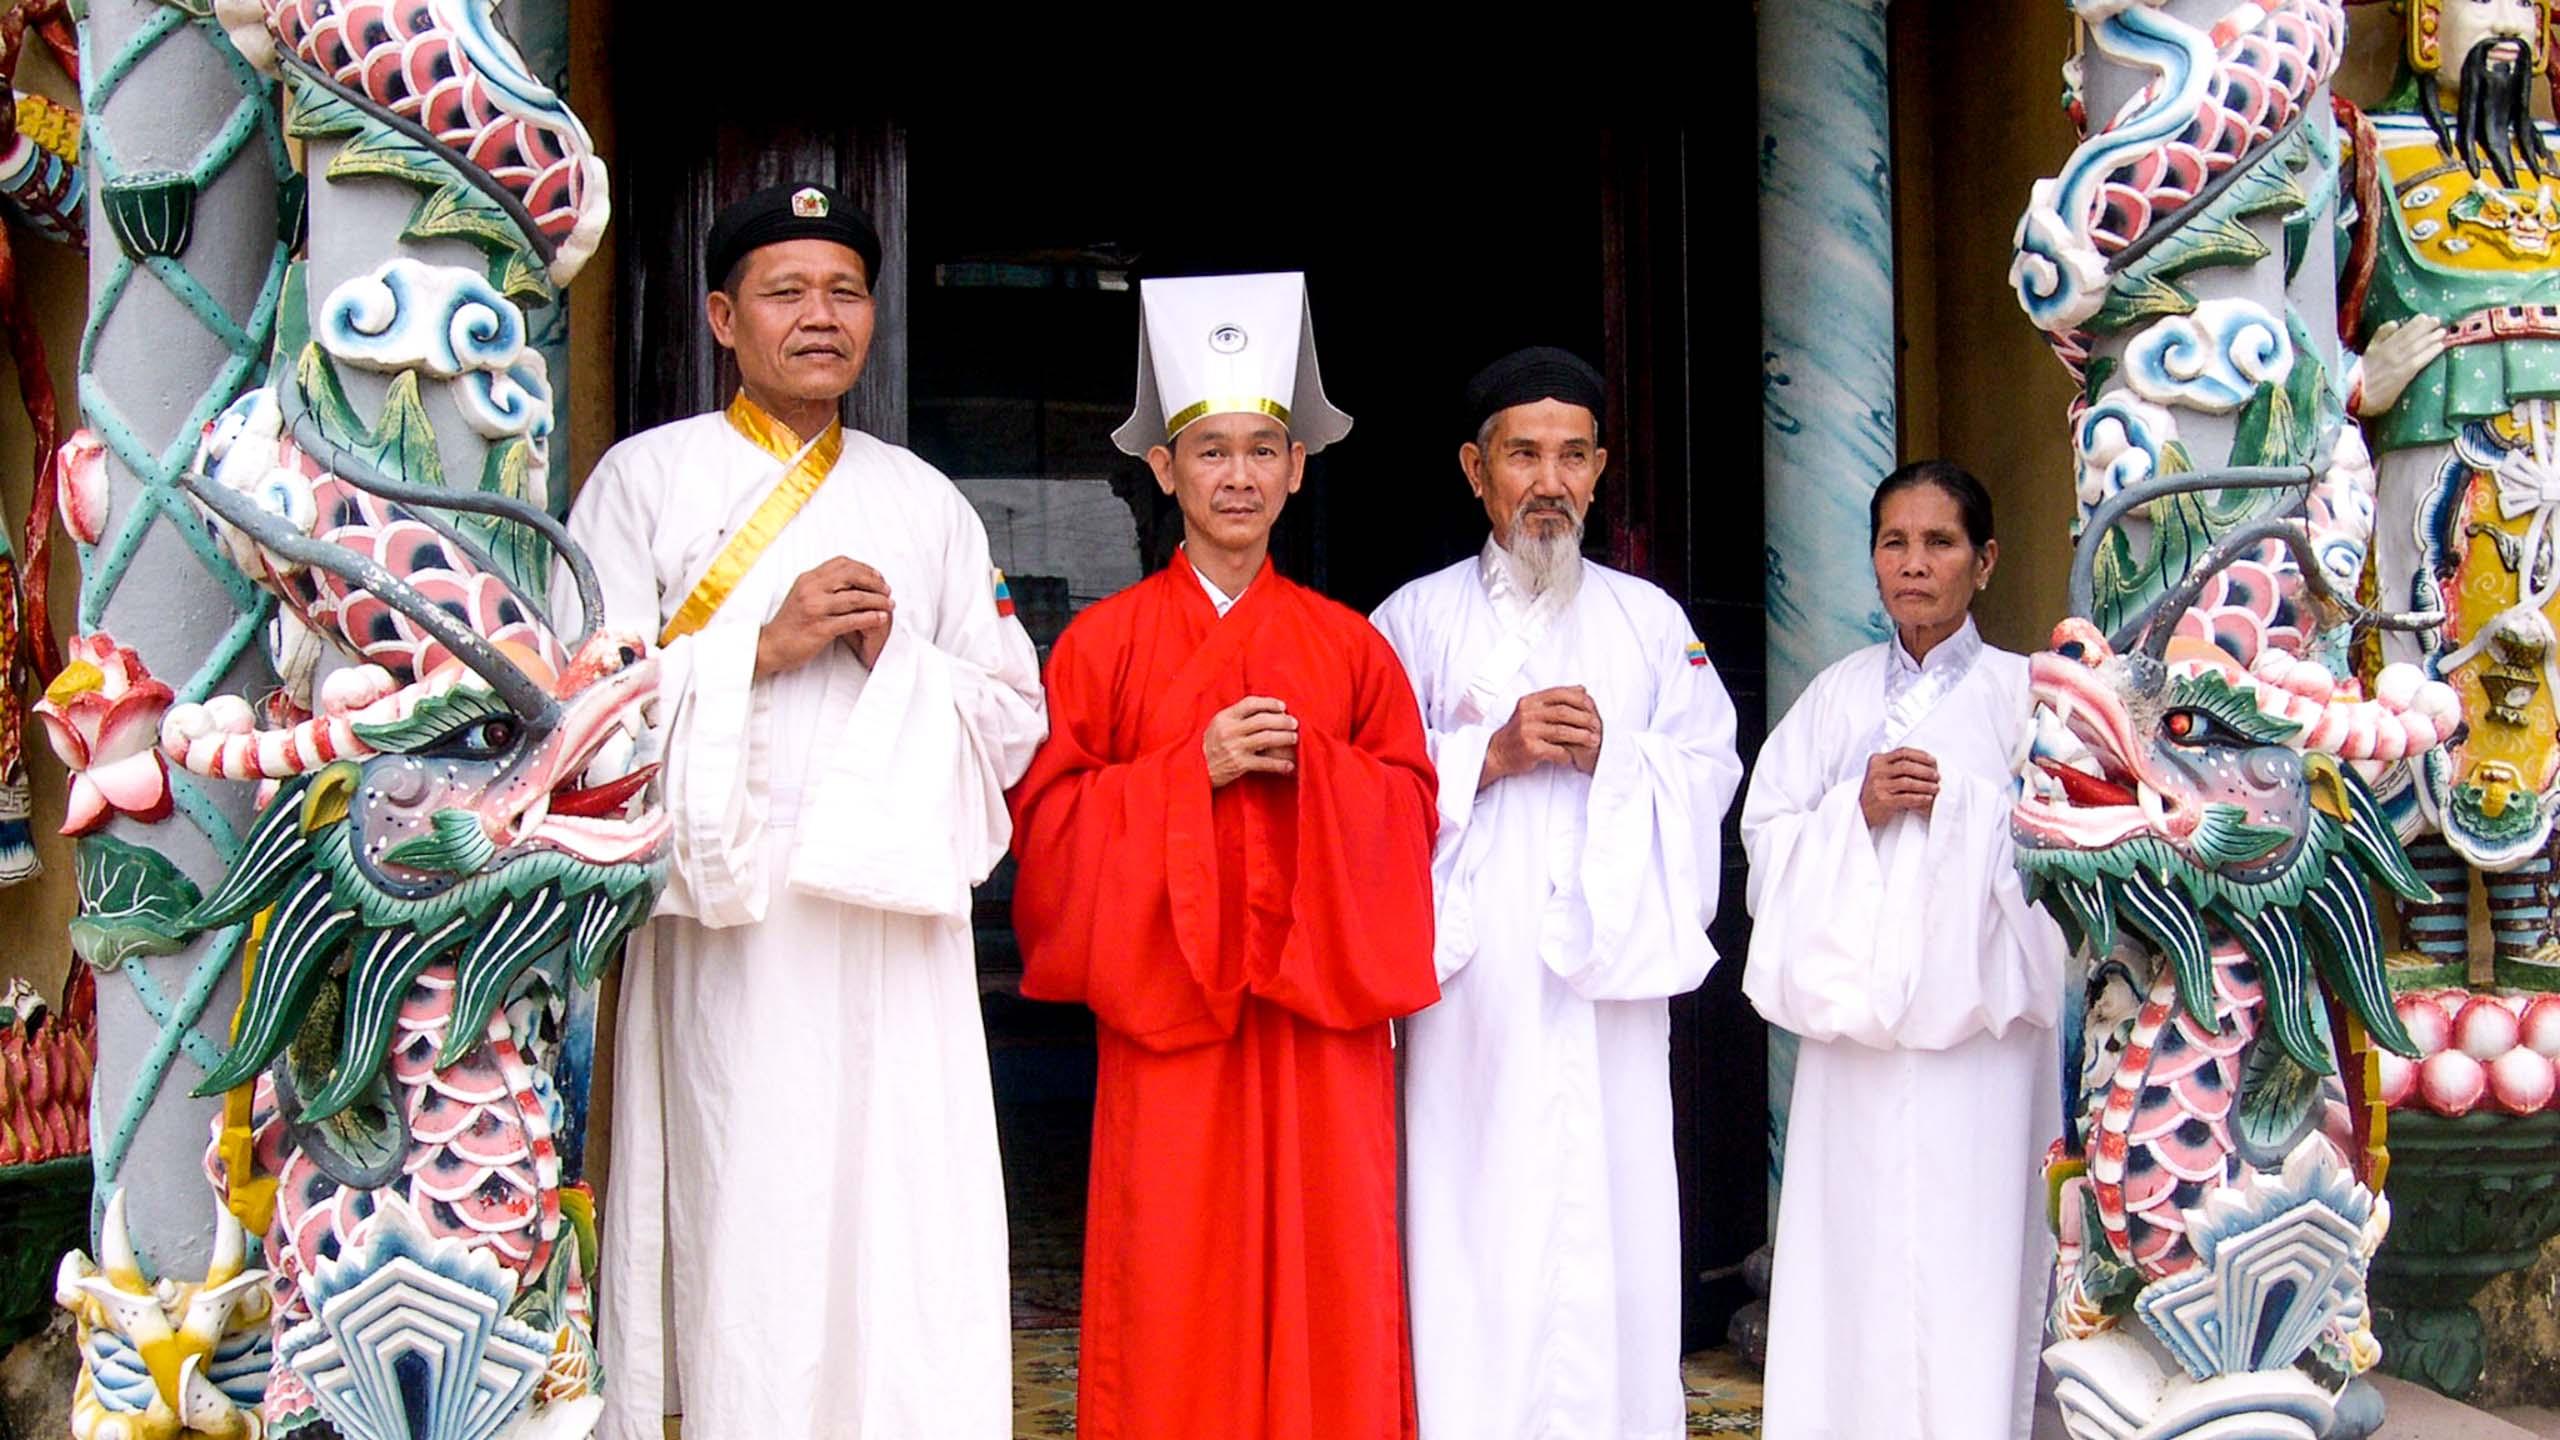 Group of Vietnam men wearing robes